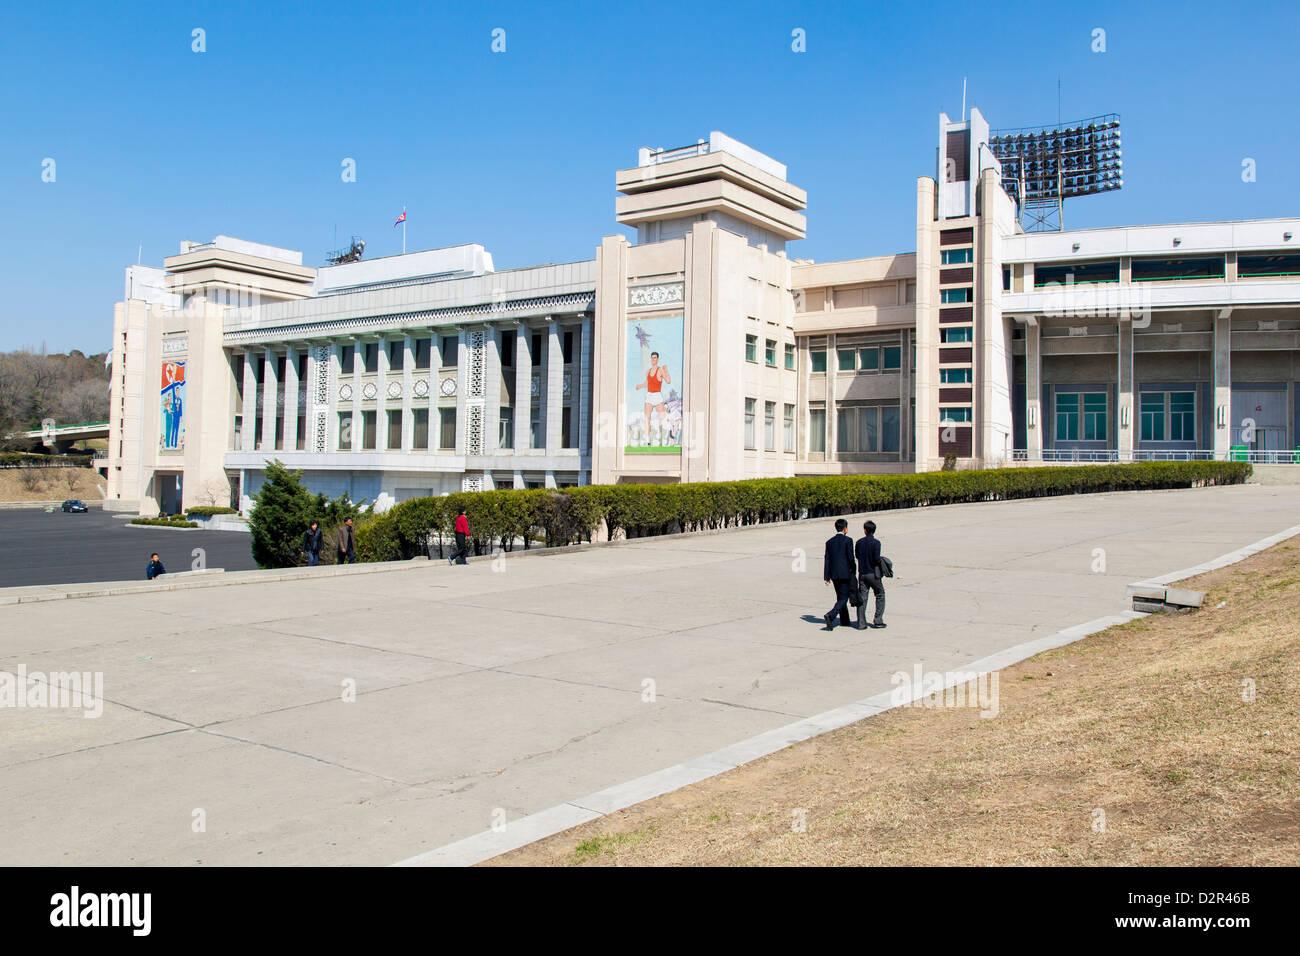 Kim Il Sung Stadium, Pyongyang, Democratic People's Republic of Korea (DPRK), North Korea, Asia - Stock Image